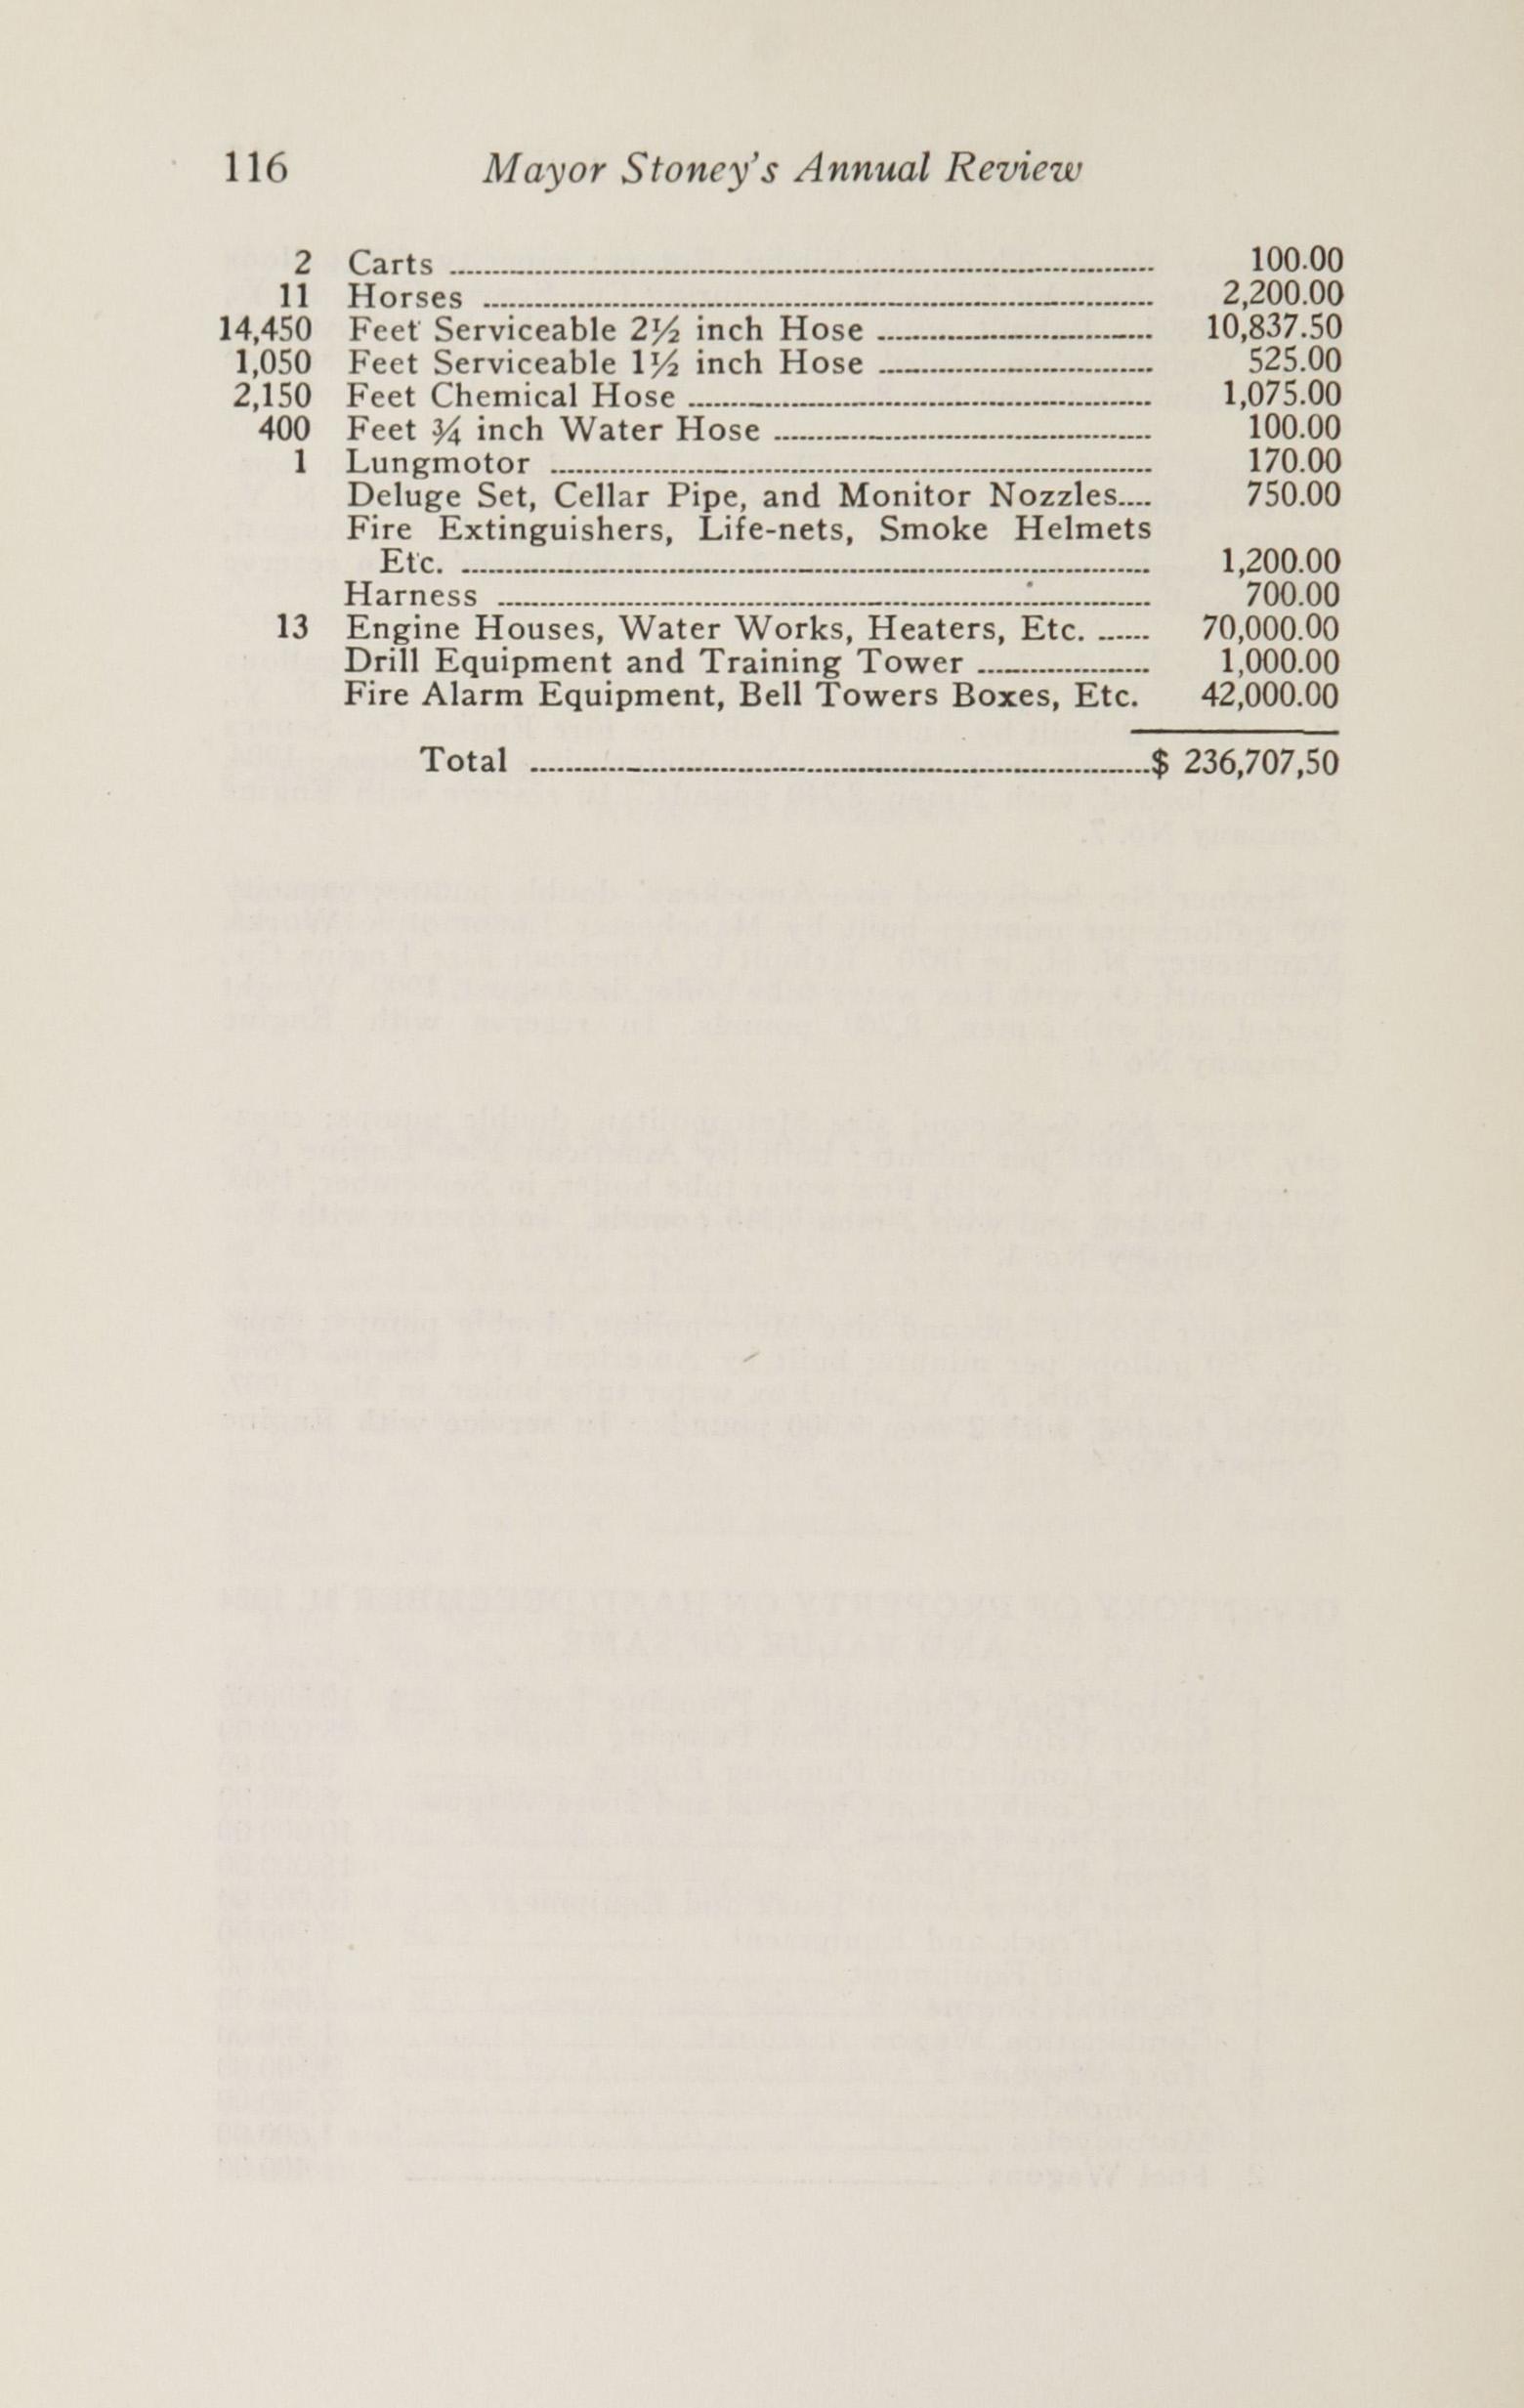 Charleston Yearbook, 1924, page 116